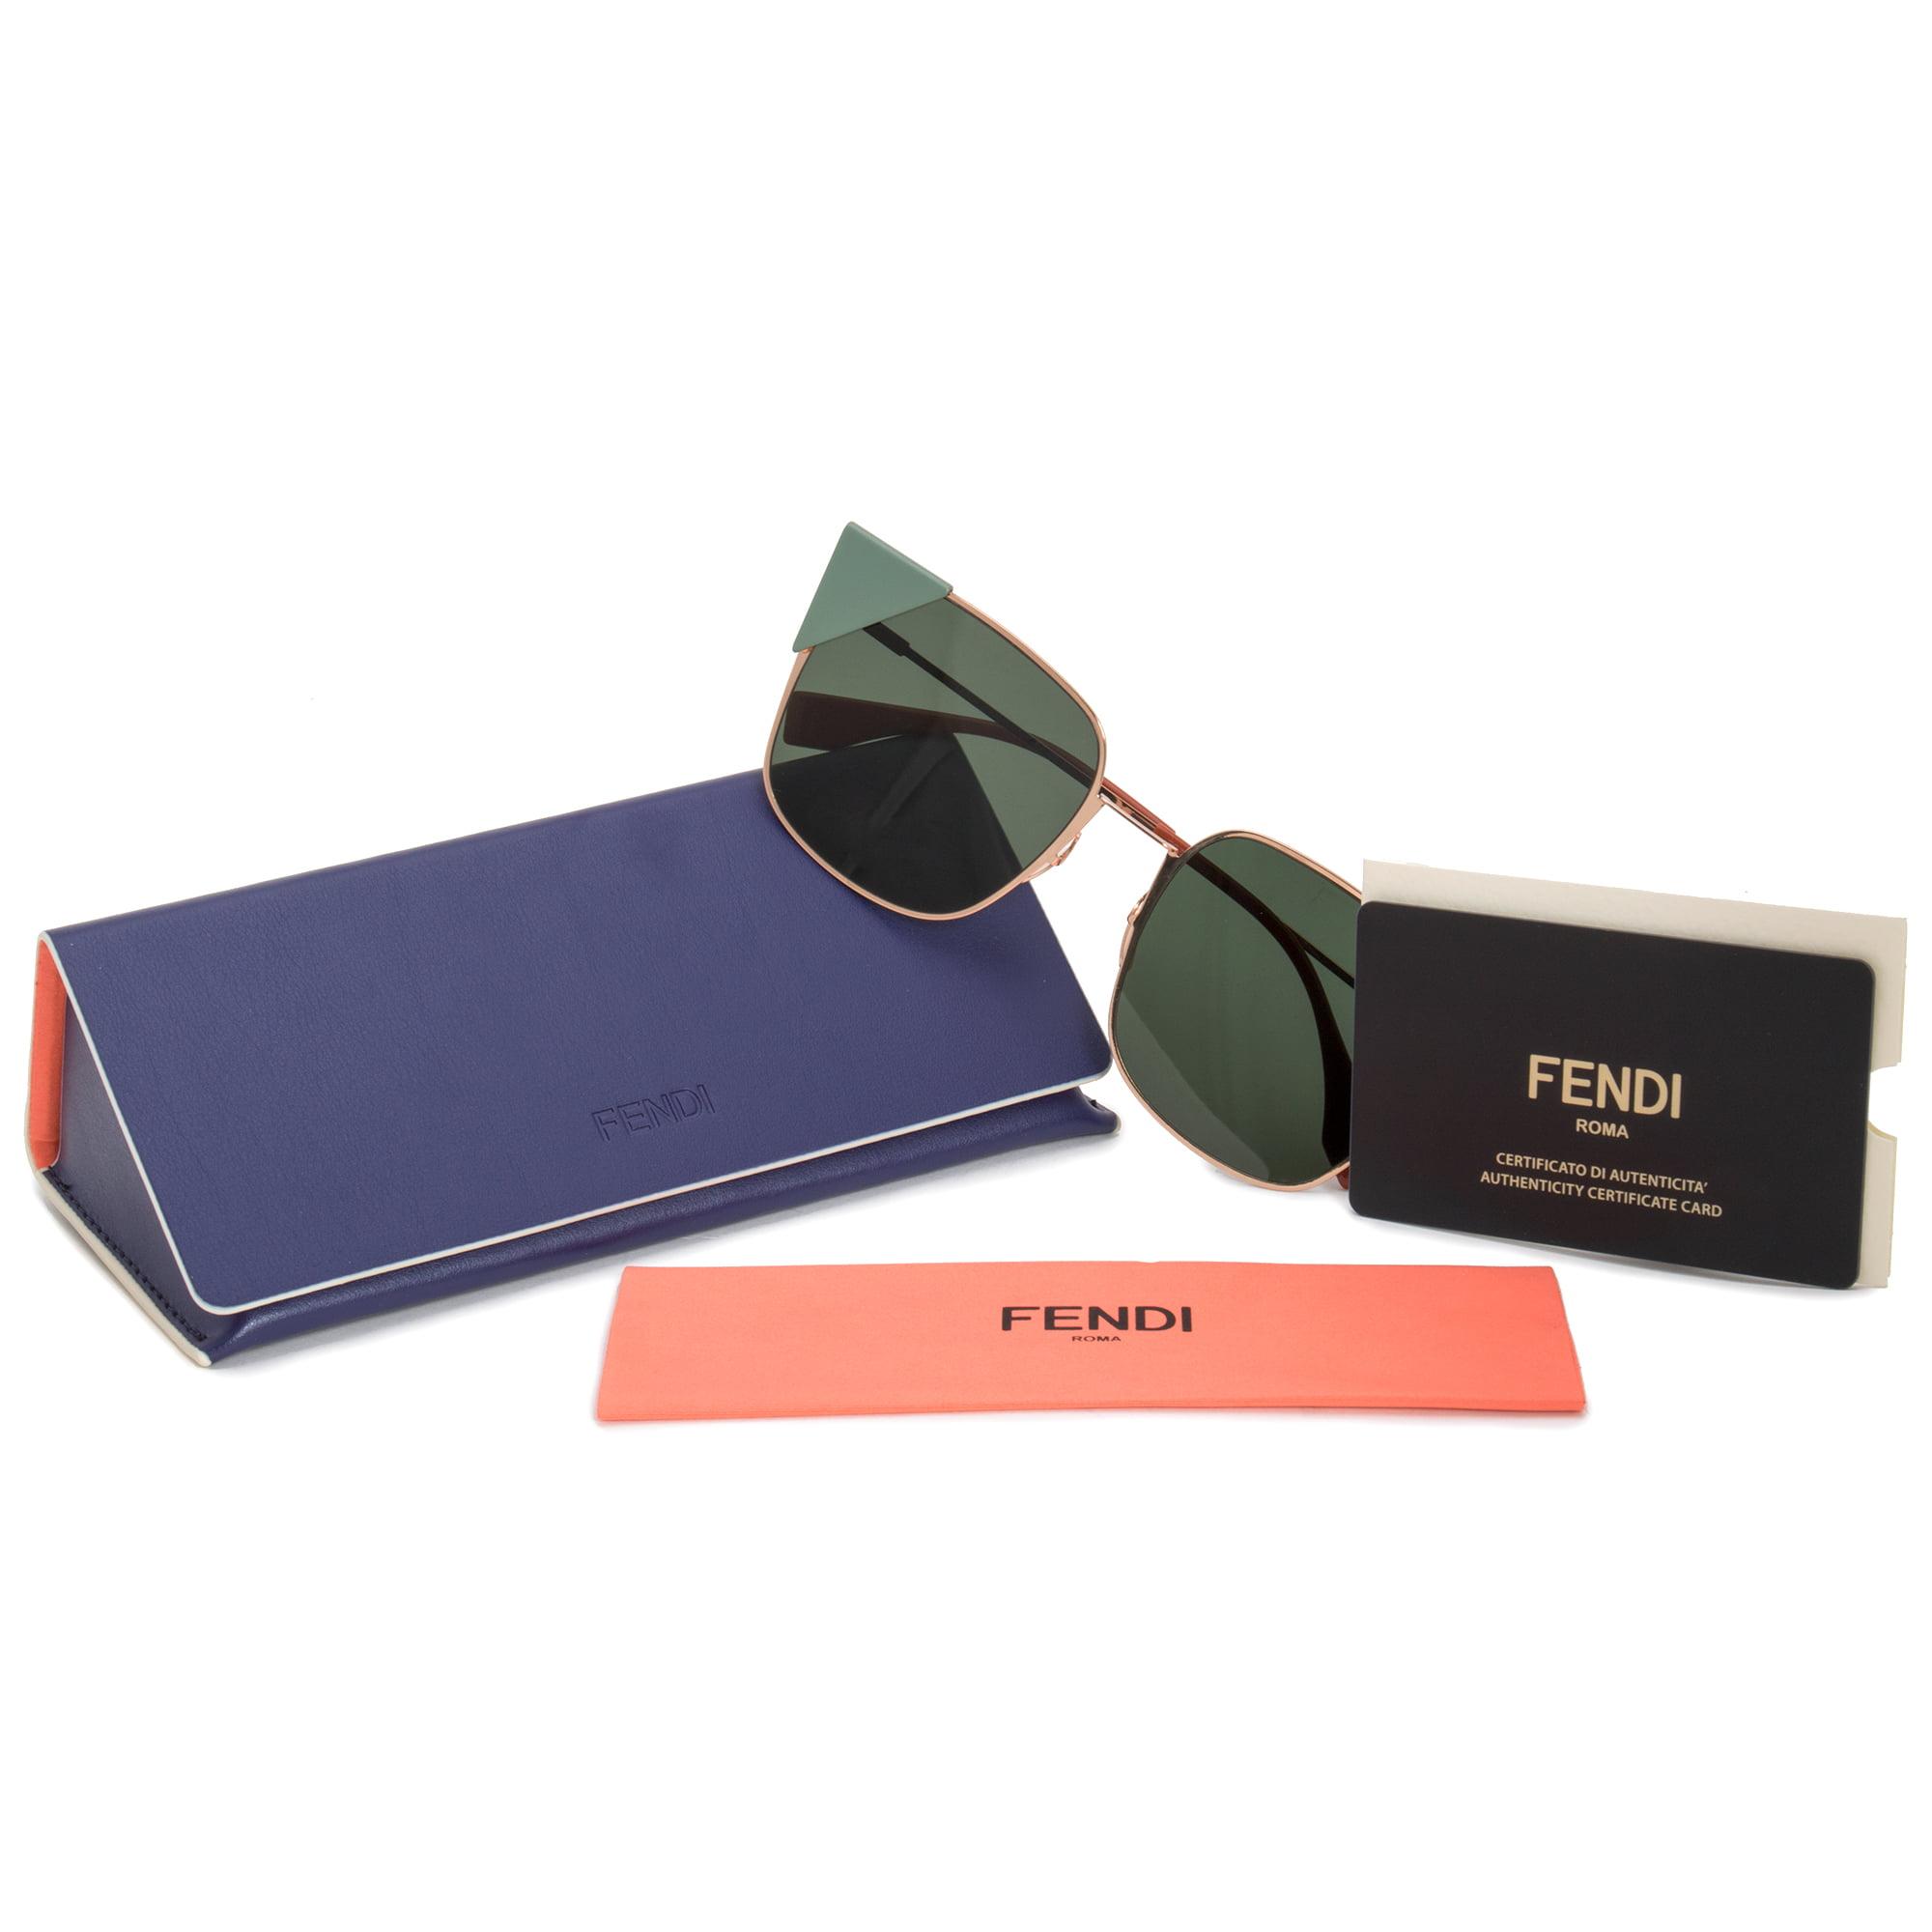 f3b08e7b2e9 Fendi - Fendi Lei Square Sunglasses FF0191S DDB 07 55 - Walmart.com